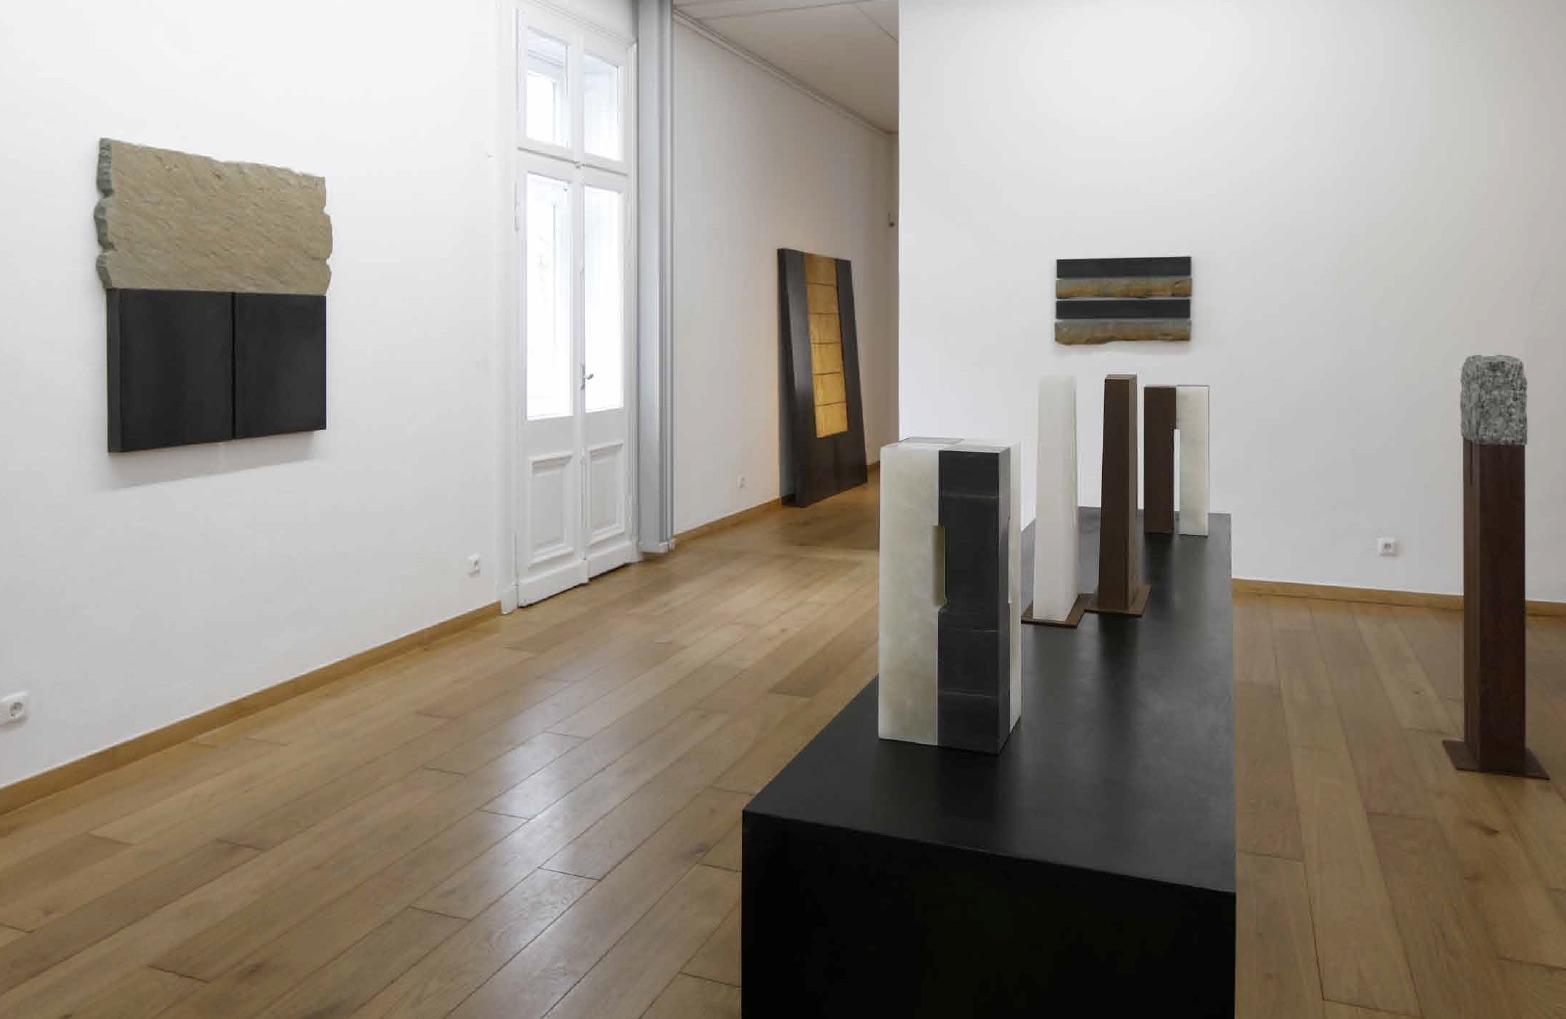 exhibition view Kunstmuseum Gelsenkirchen